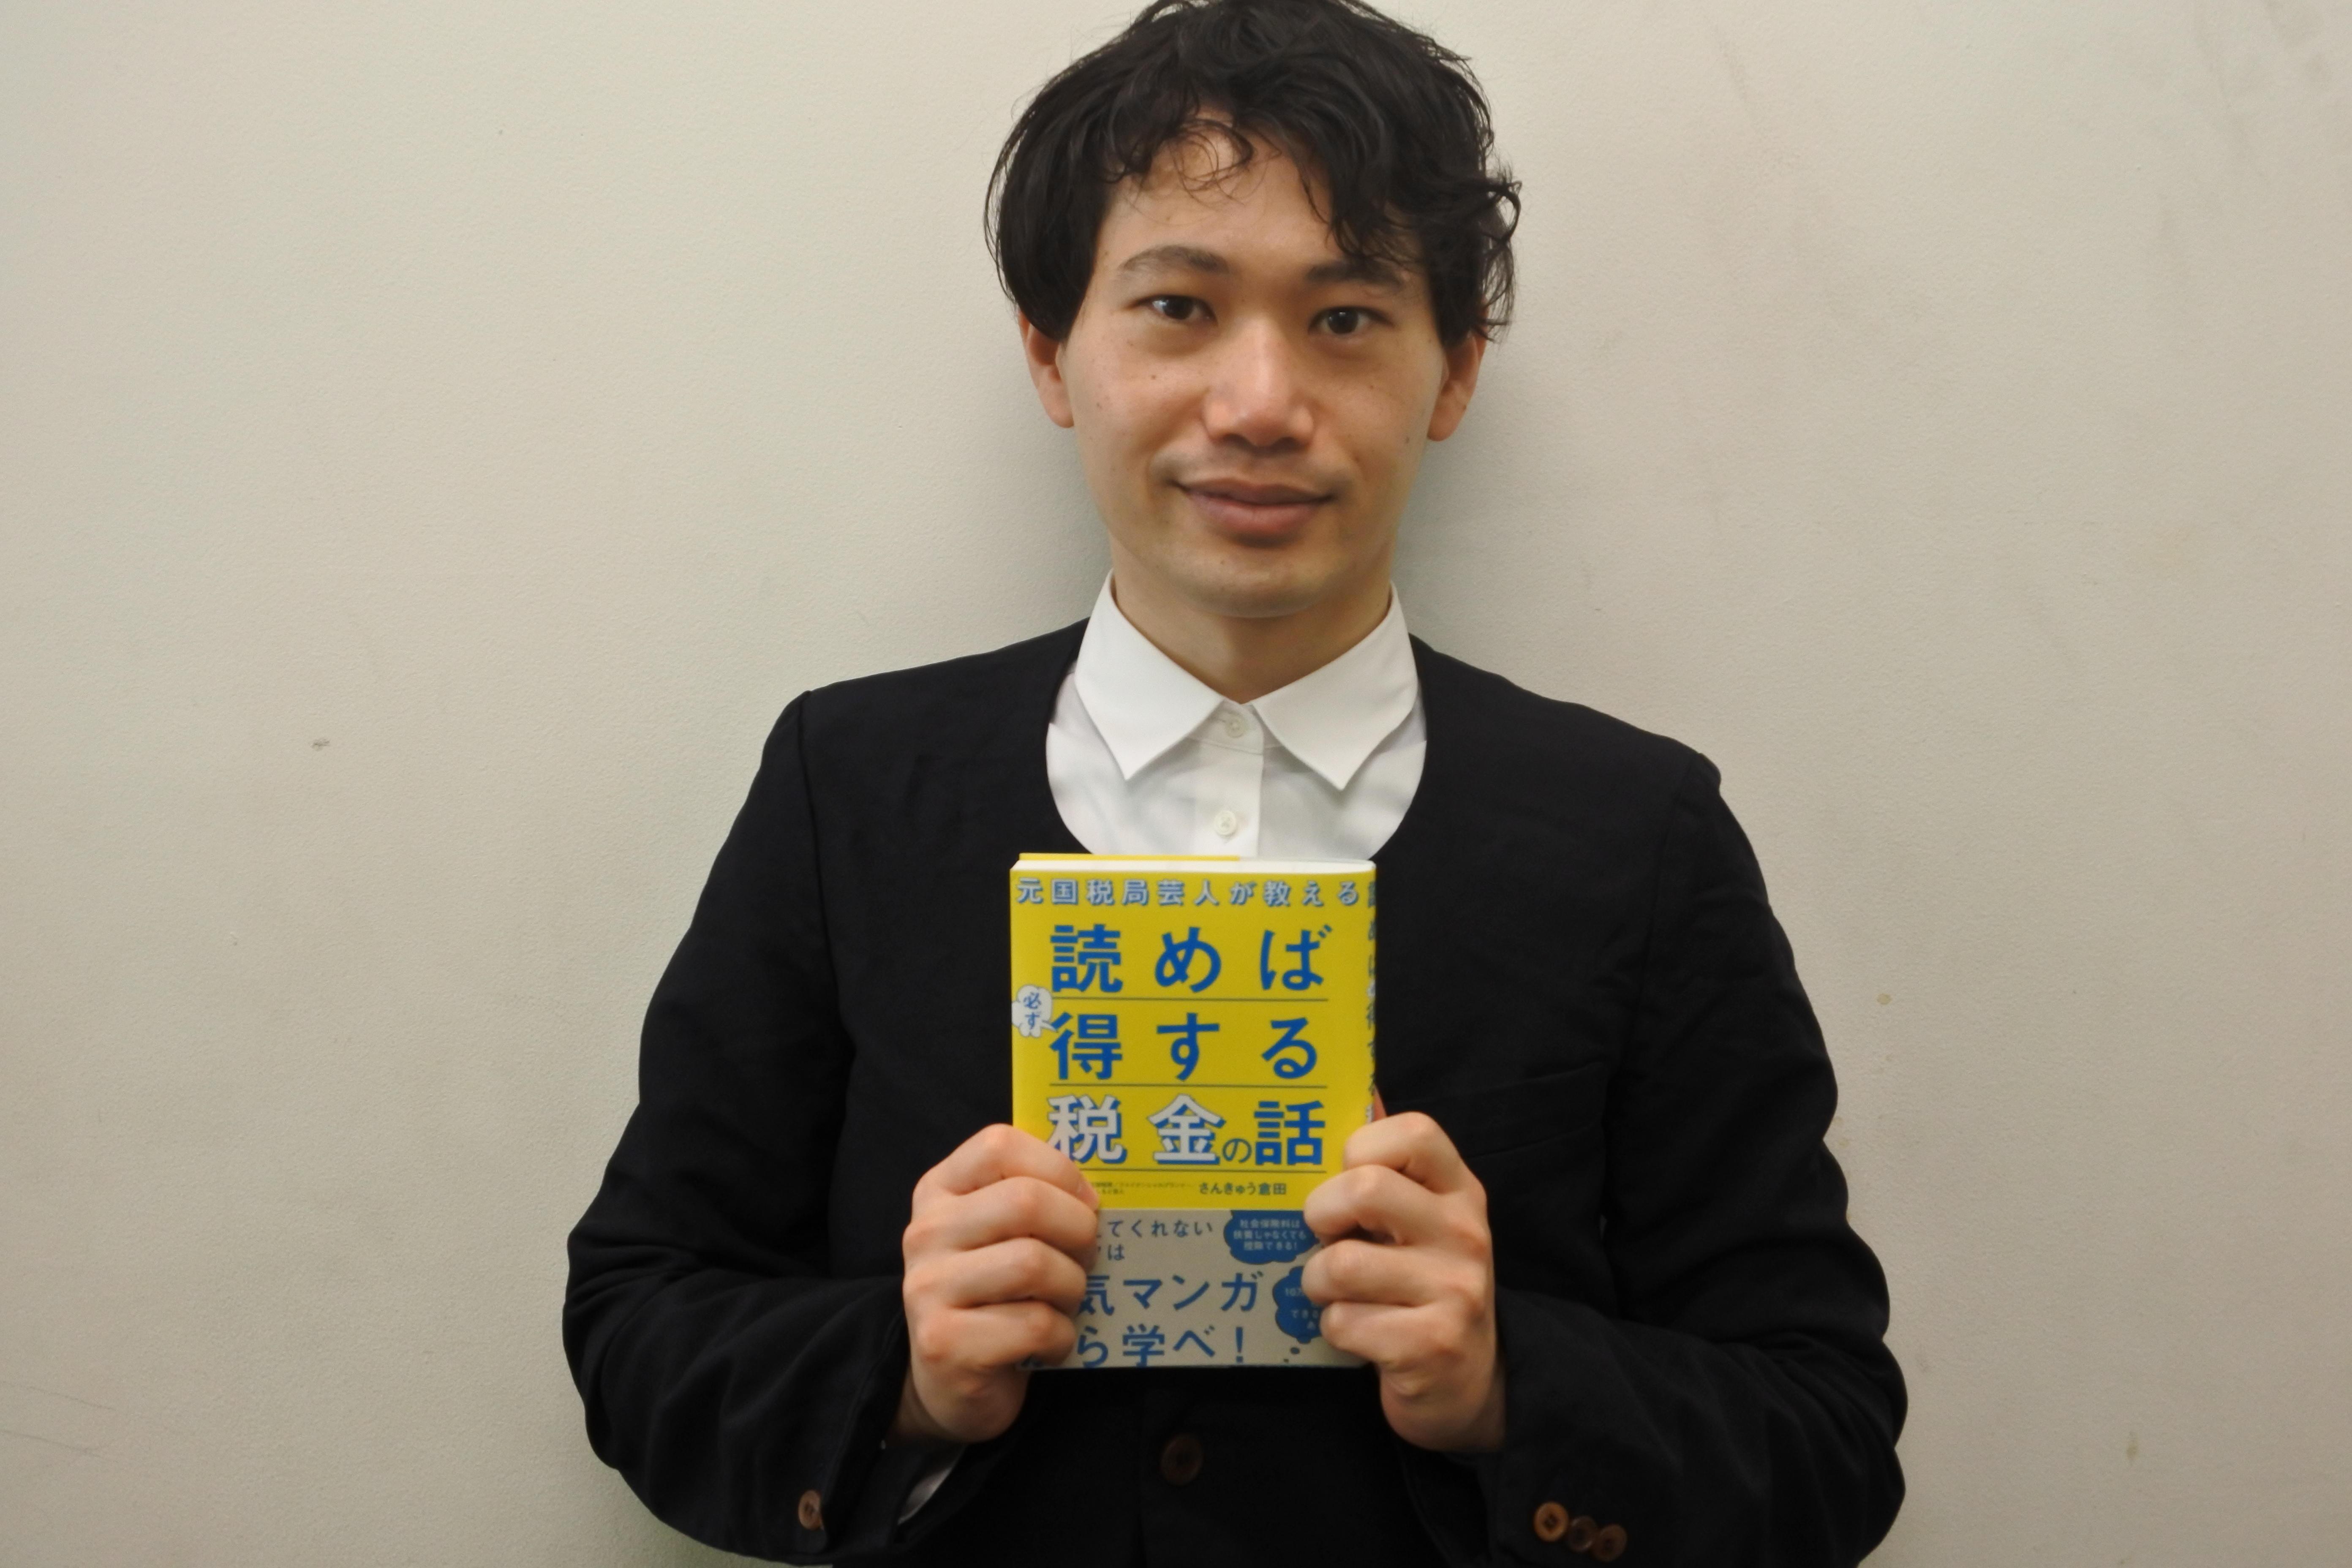 http://news.yoshimoto.co.jp/20171225092956-9802c19e9d0486c13db8ff28aaf8b97250f4a647.jpg